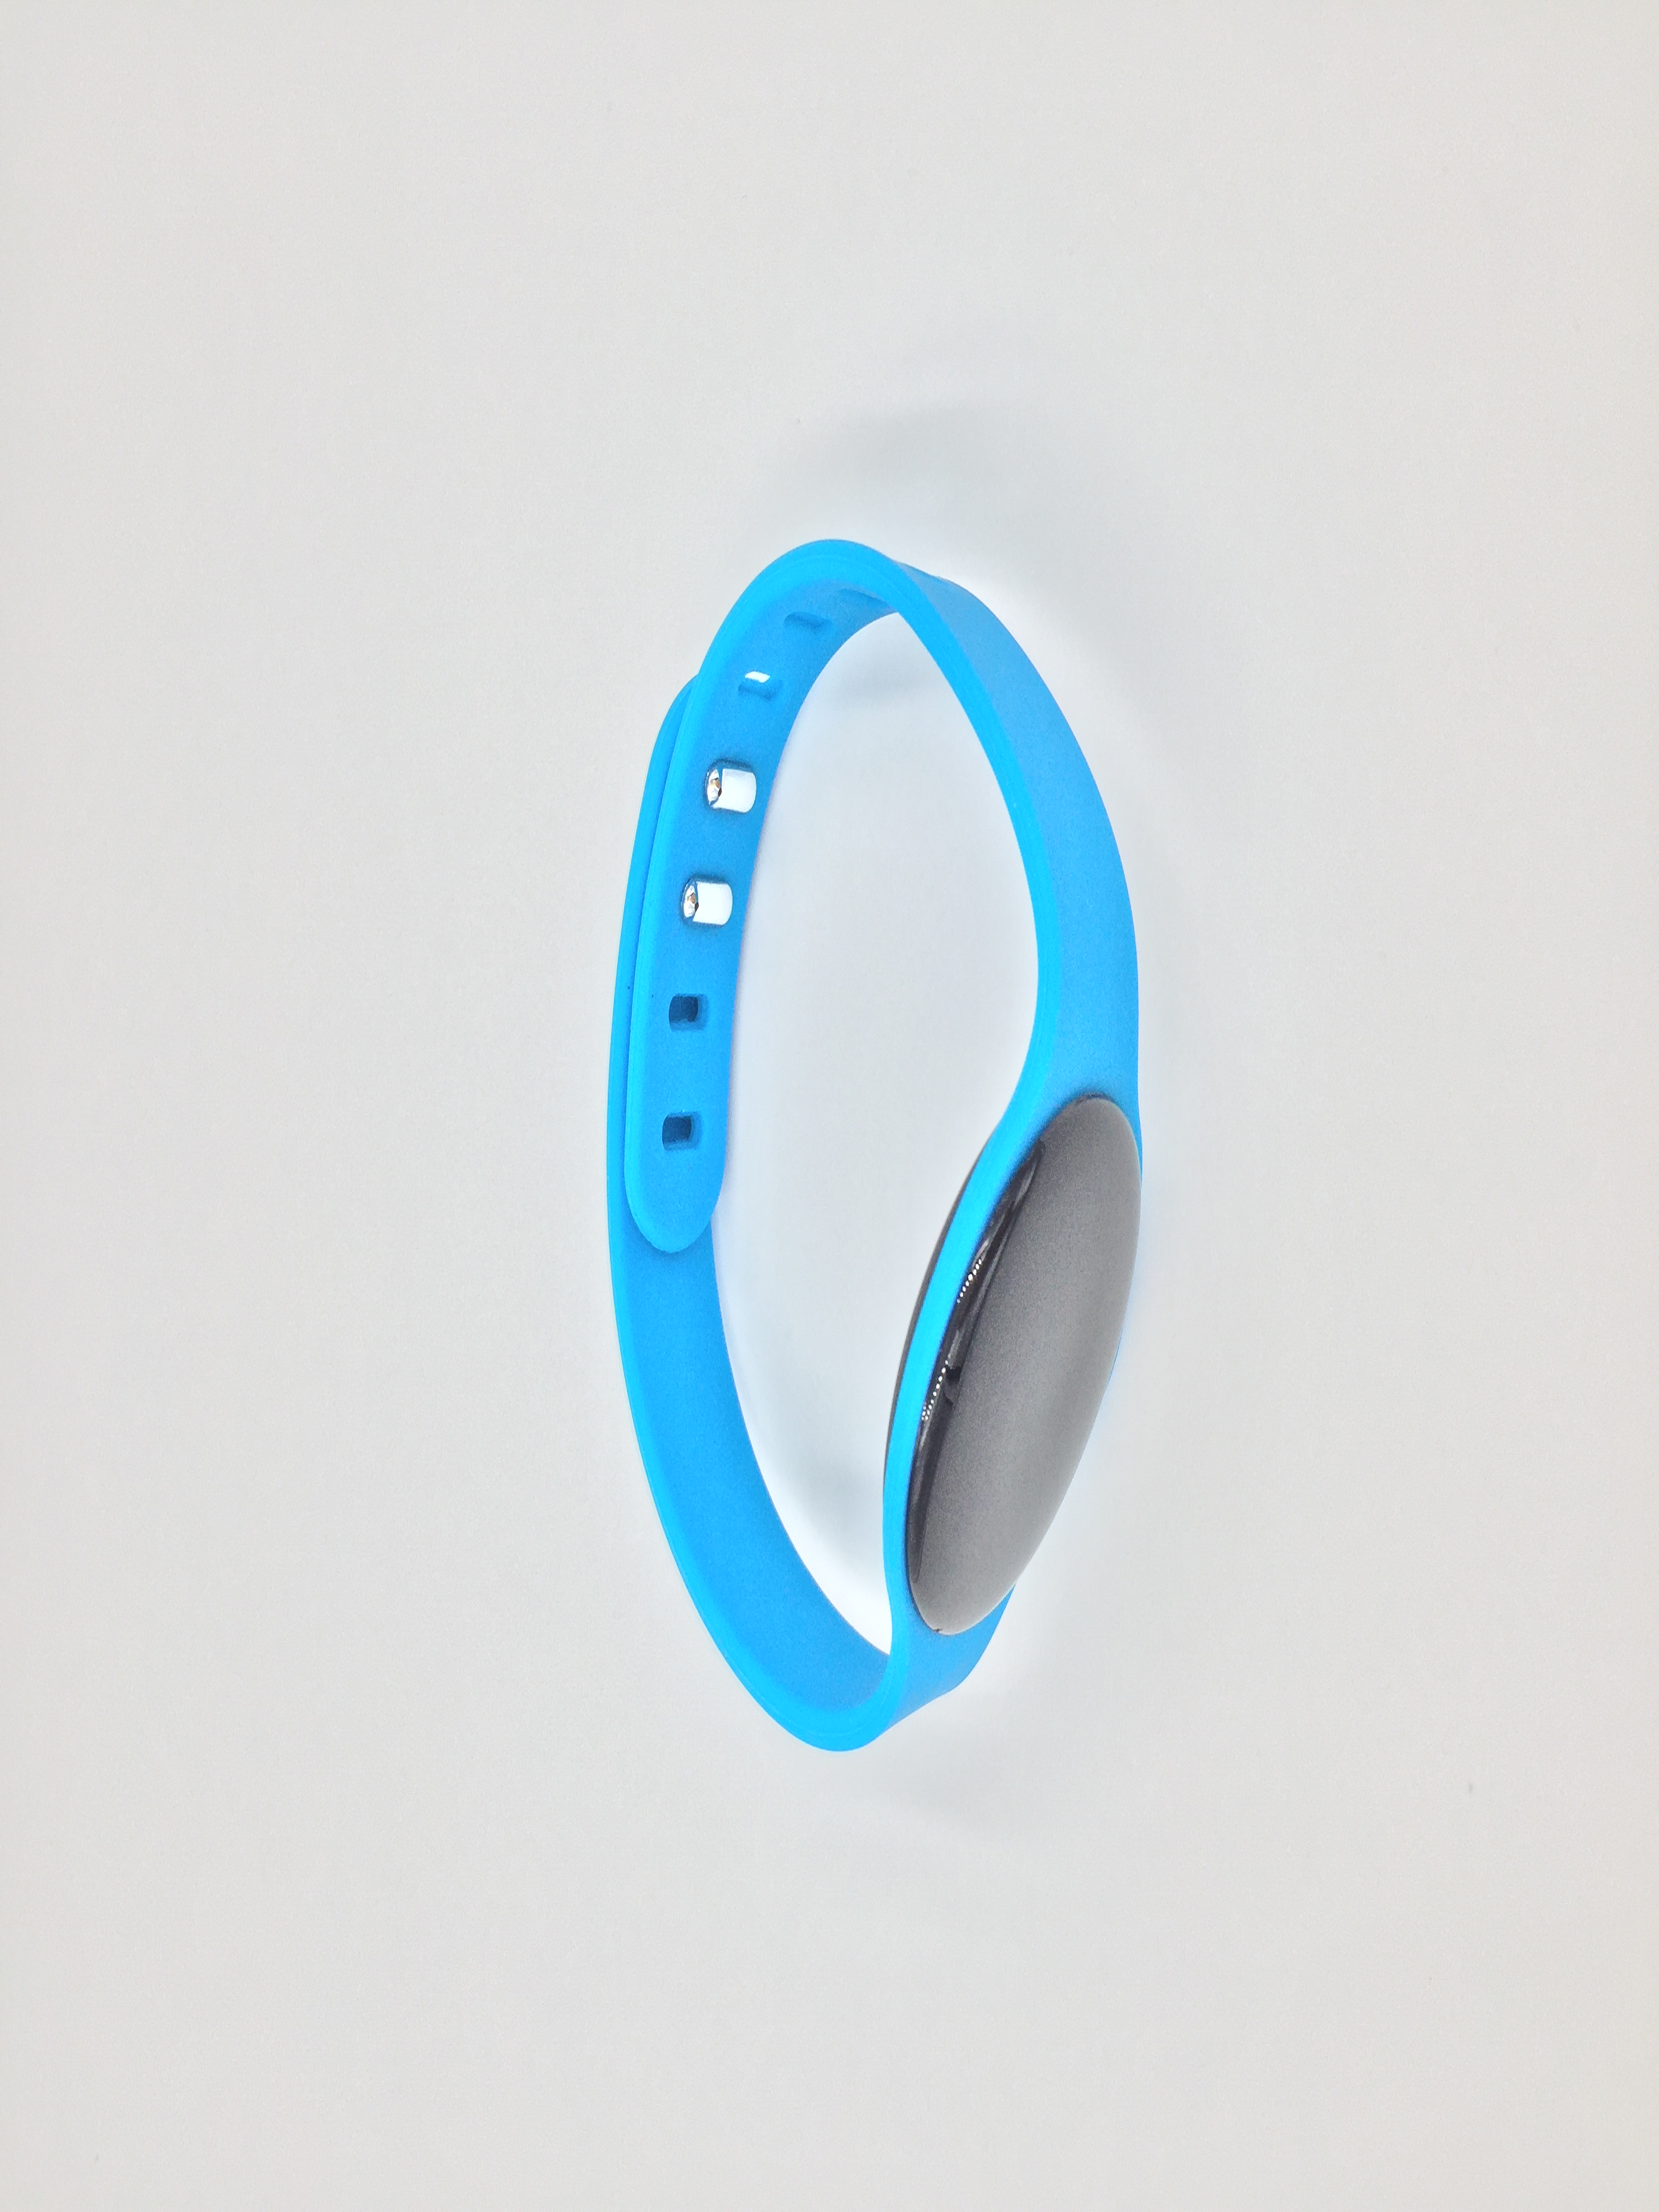 New product! NRF51822 Bracelet development board andy al affendi abdullah and faieza abdul aziz product development process improvement